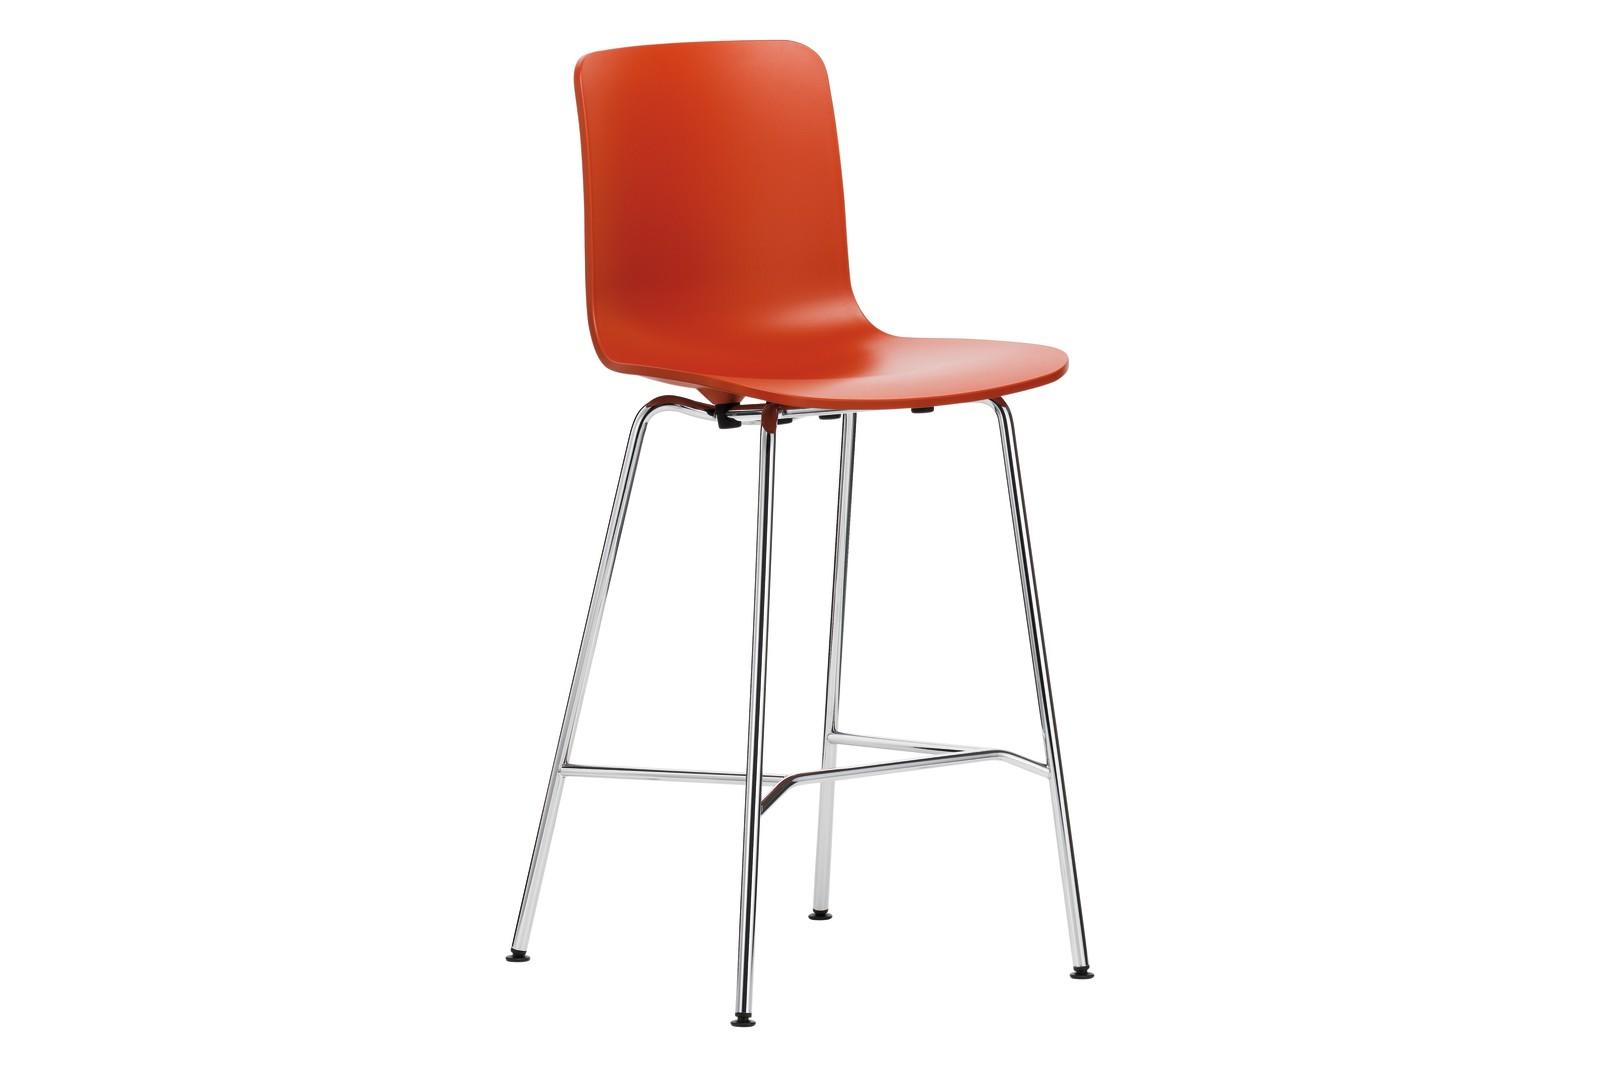 HAL Stool Medium 65 orange, 04 glides for carpet, 30 basic dark